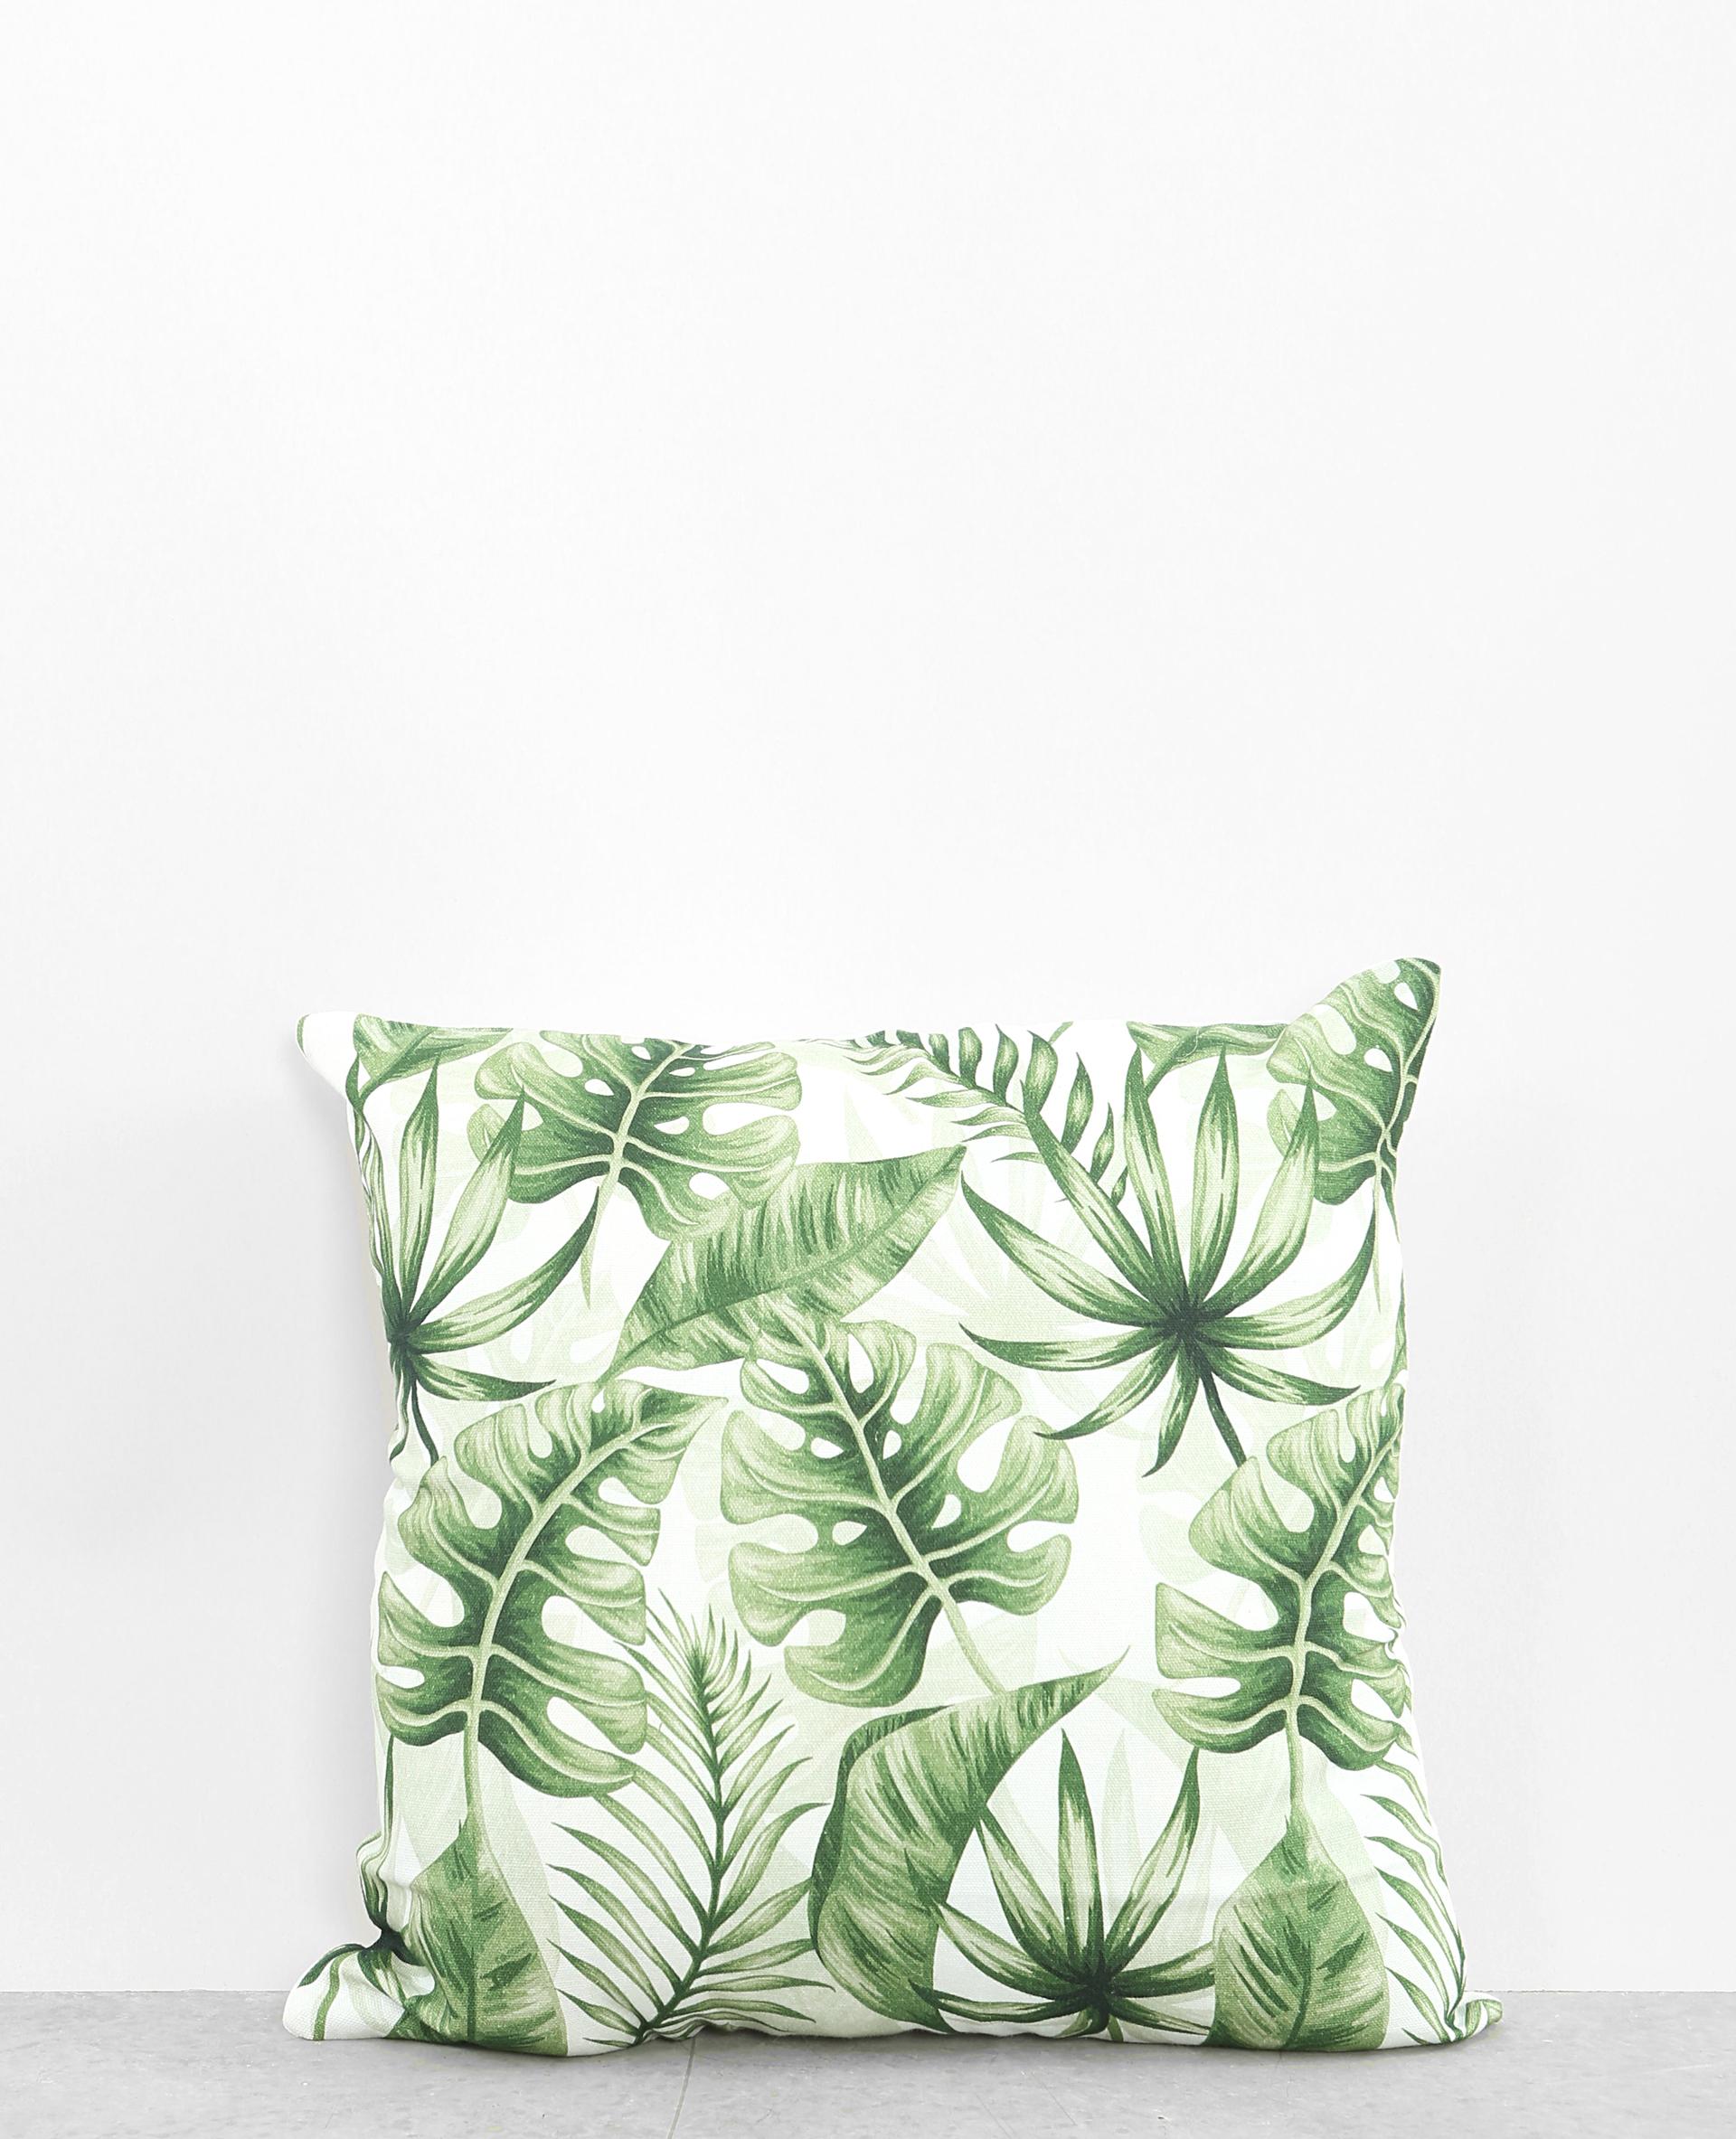 housse de coussin palmier vert 902872a50i05 pimkie. Black Bedroom Furniture Sets. Home Design Ideas